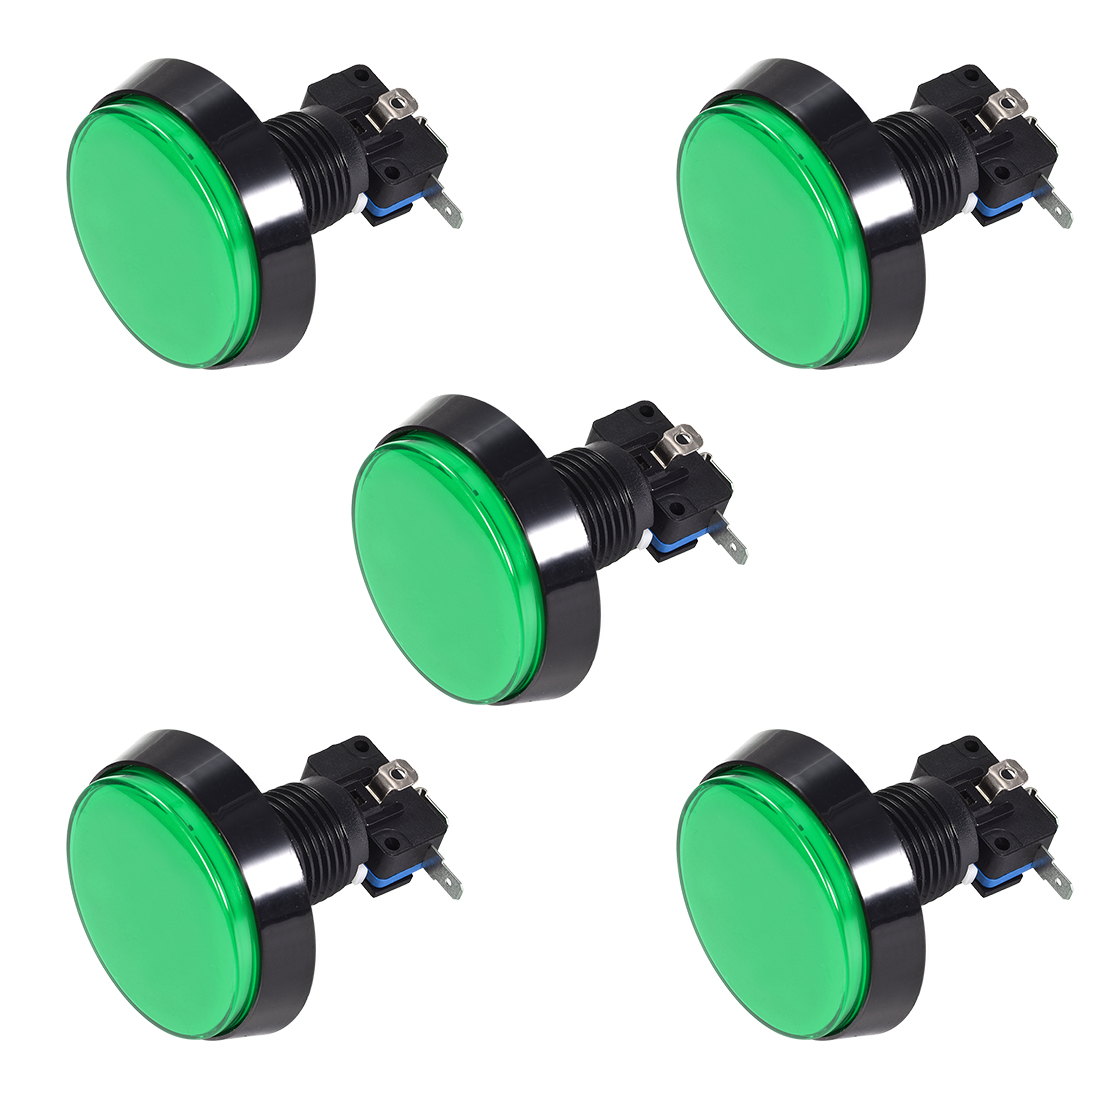 Game Push Button 60mm Round 12V LED Illuminated Push Button Switch Green 5pcs